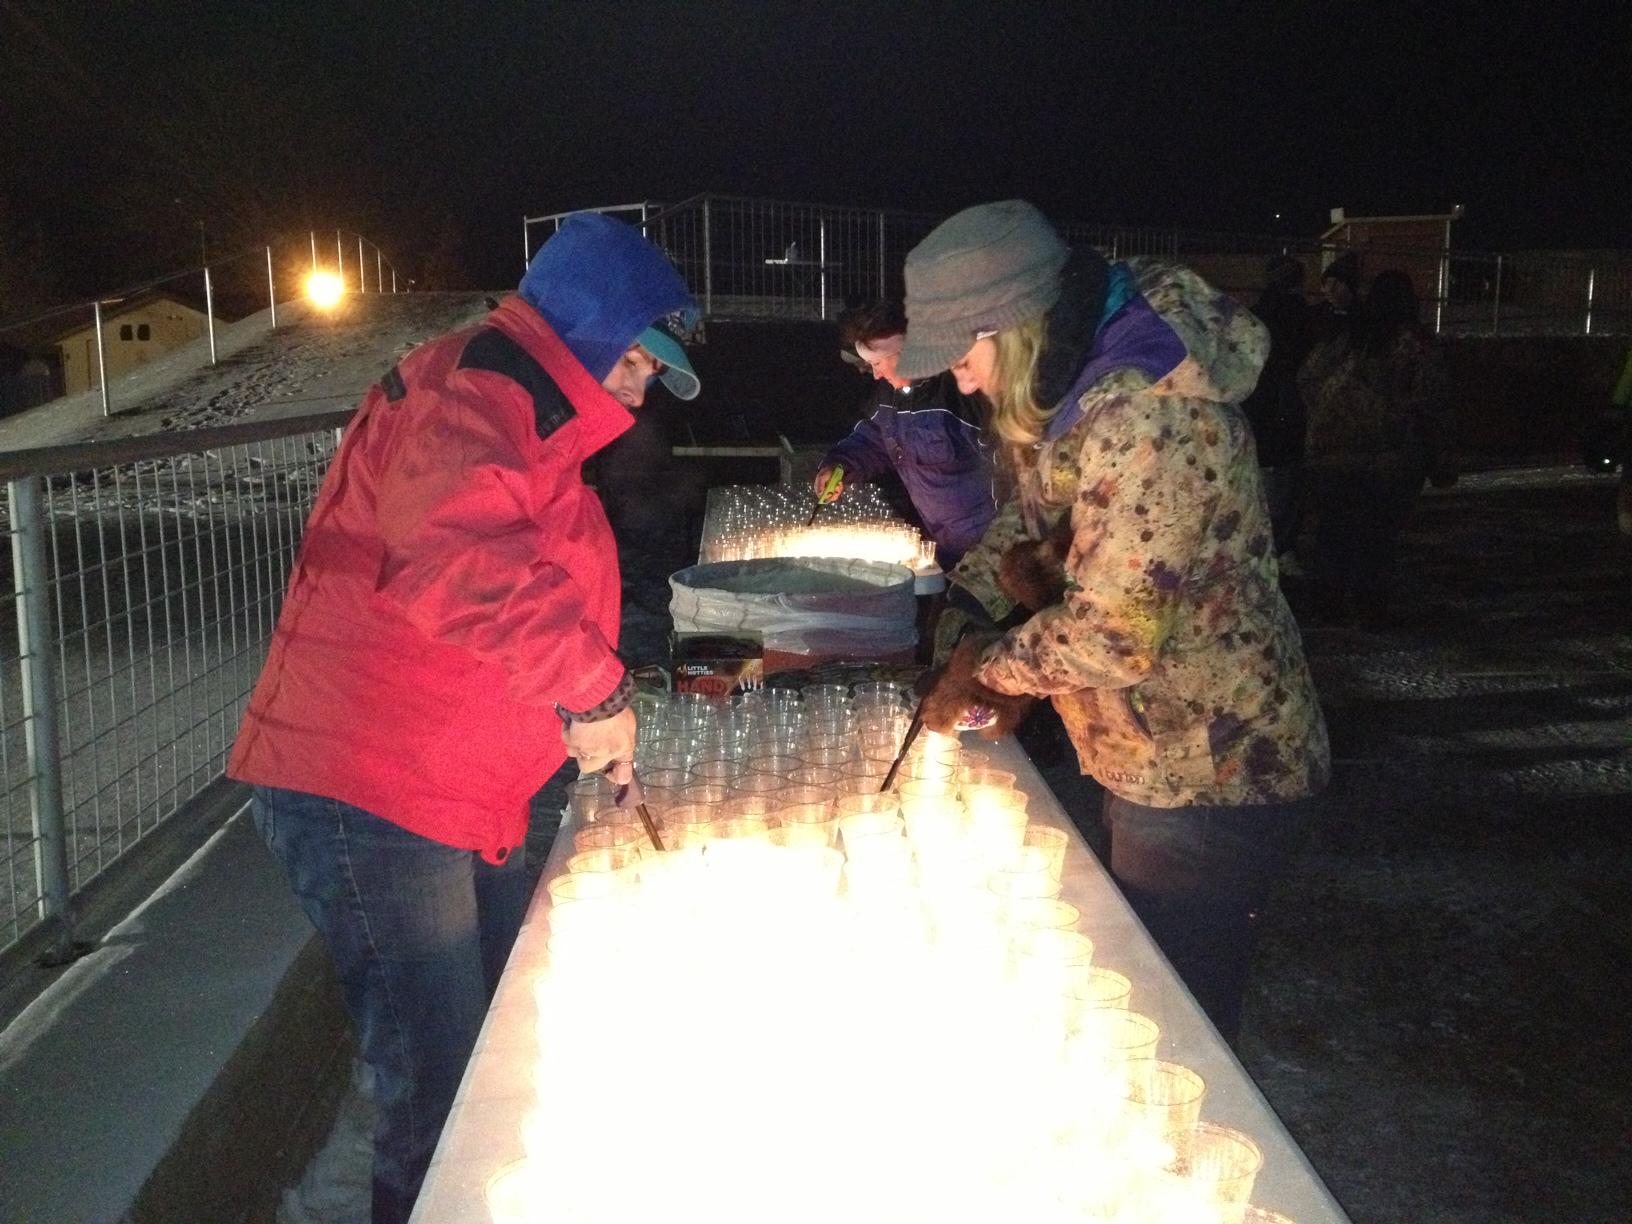 Azlyn Brandenburg and Catherine baher light votive candles before prayer vigil for David Grunwald on Friday. (Photo by Ellen Lockyer, Alaska Public Media - Anchorage)